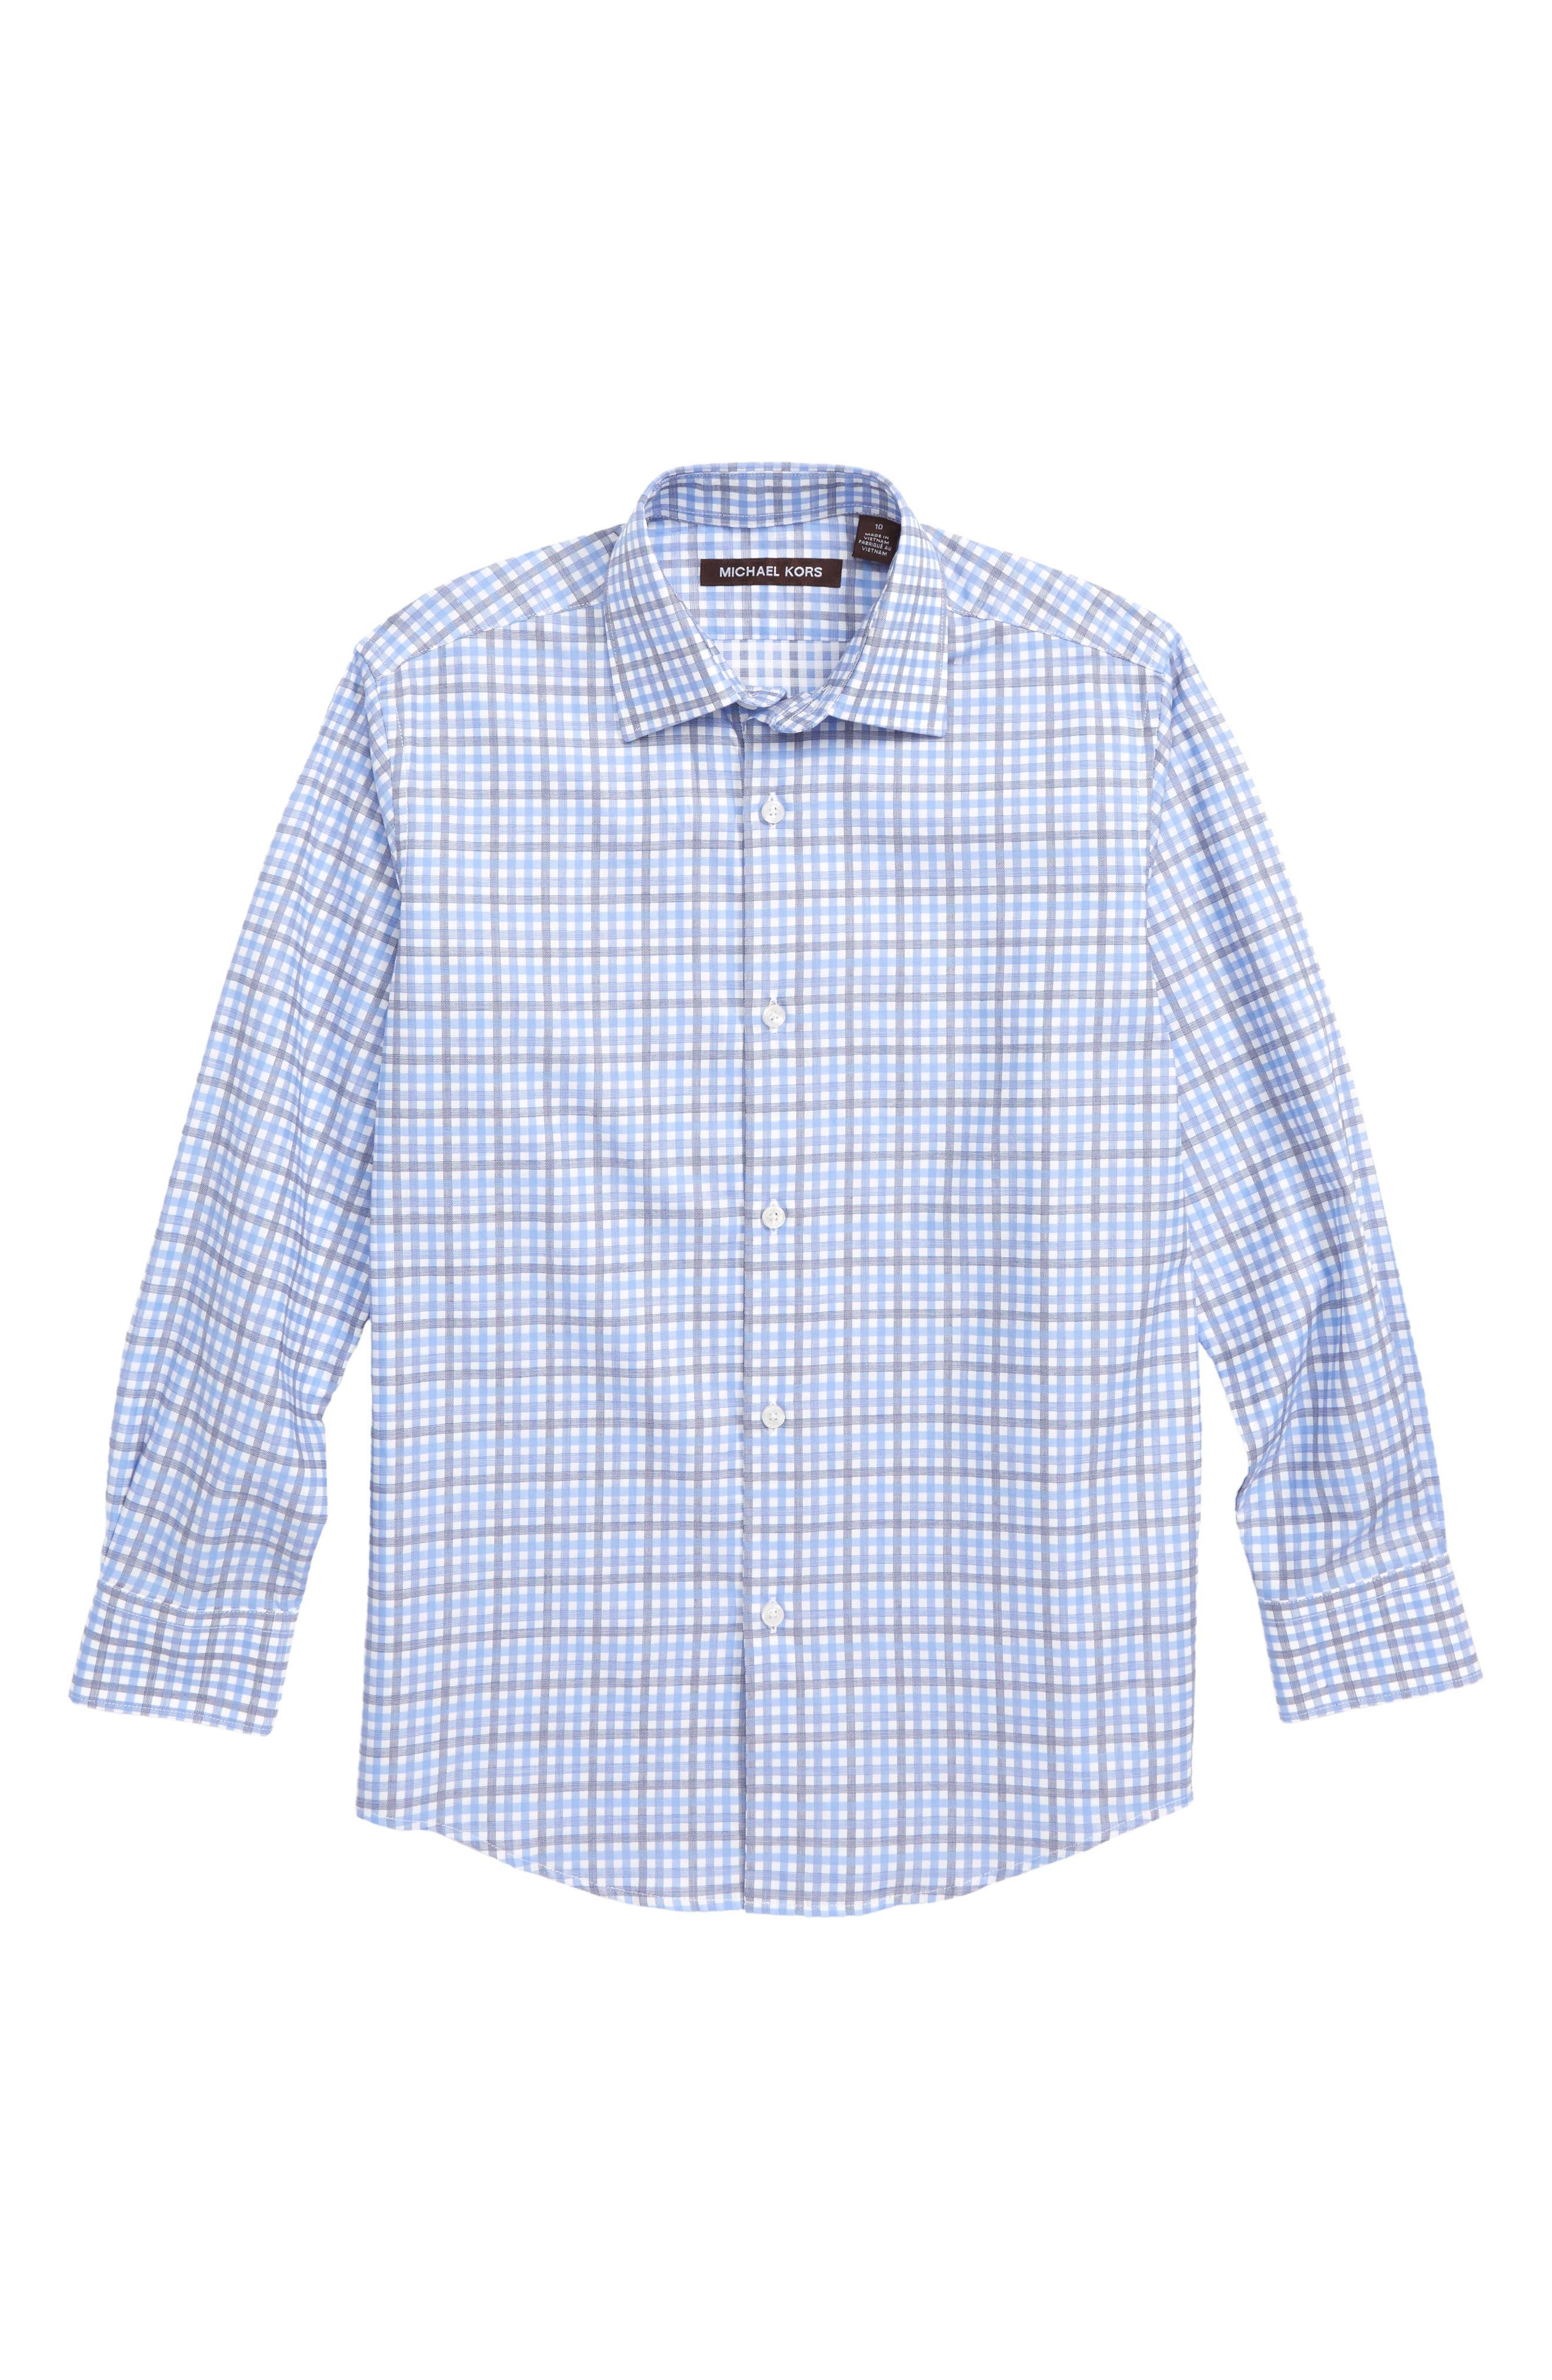 MICHAEL KORS, Check Print Dress Shirt, Main thumbnail 1, color, BLUE